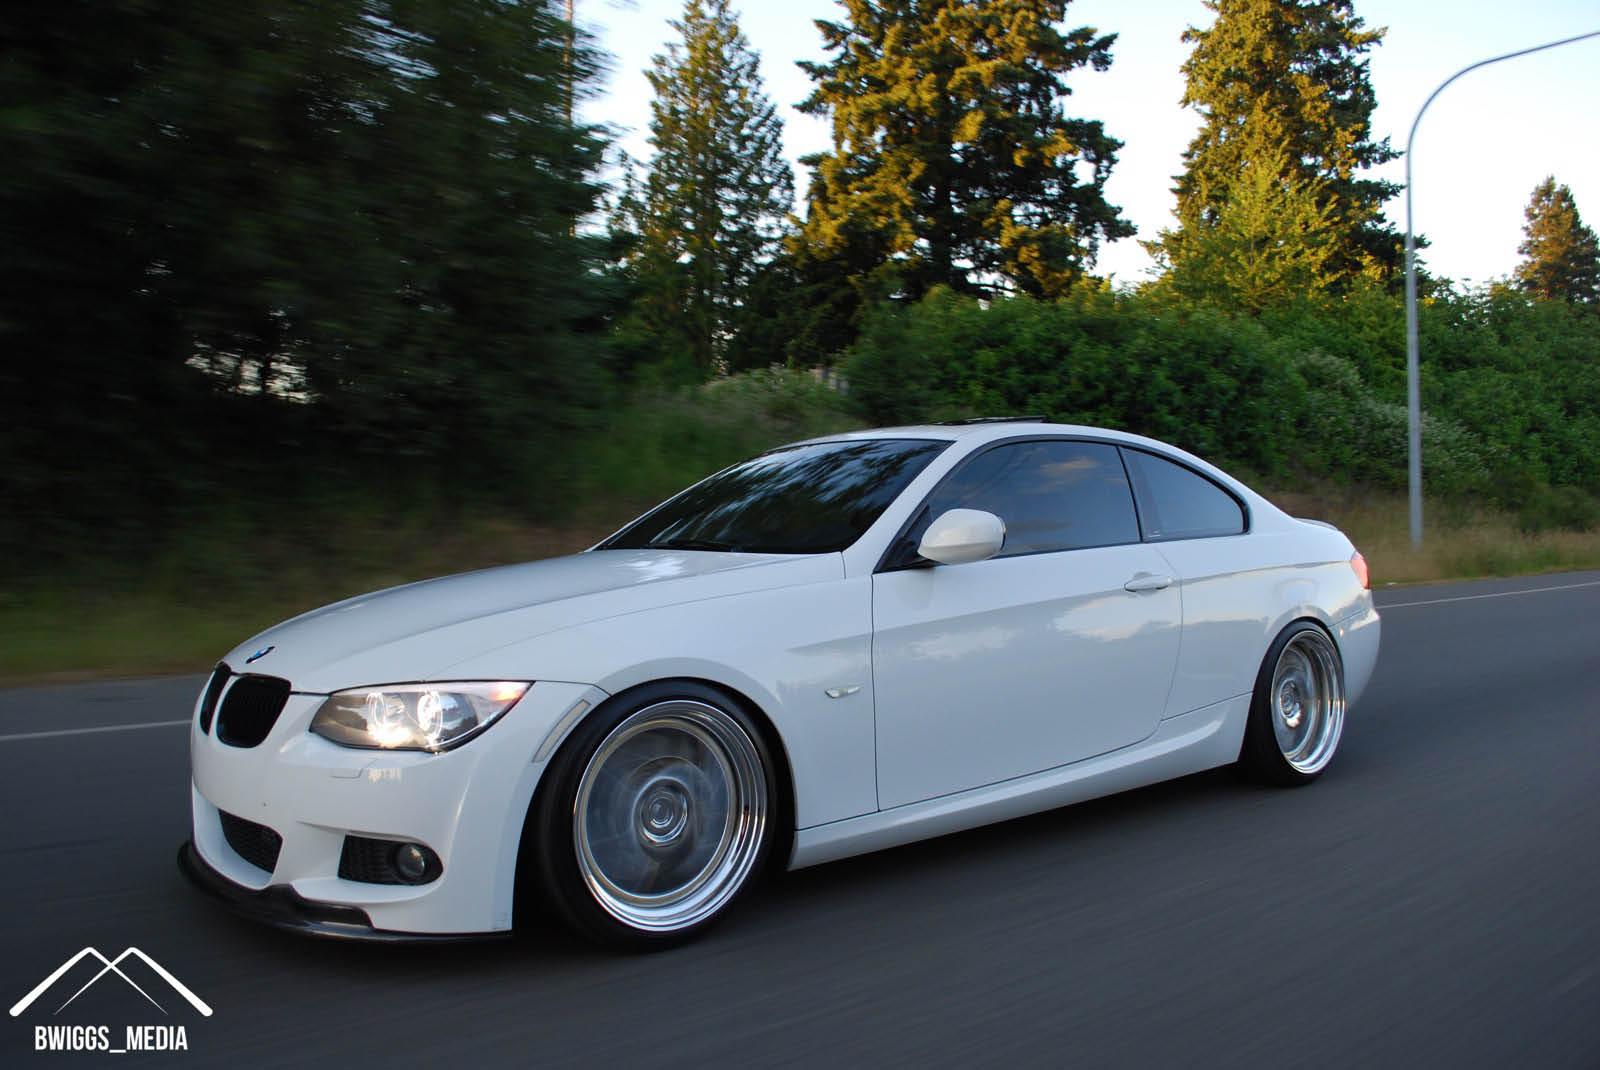 Prestige Auto Detailing - professional auto detailing in Tacoma, WA - Tacoma auto detailers - wash & wax your car